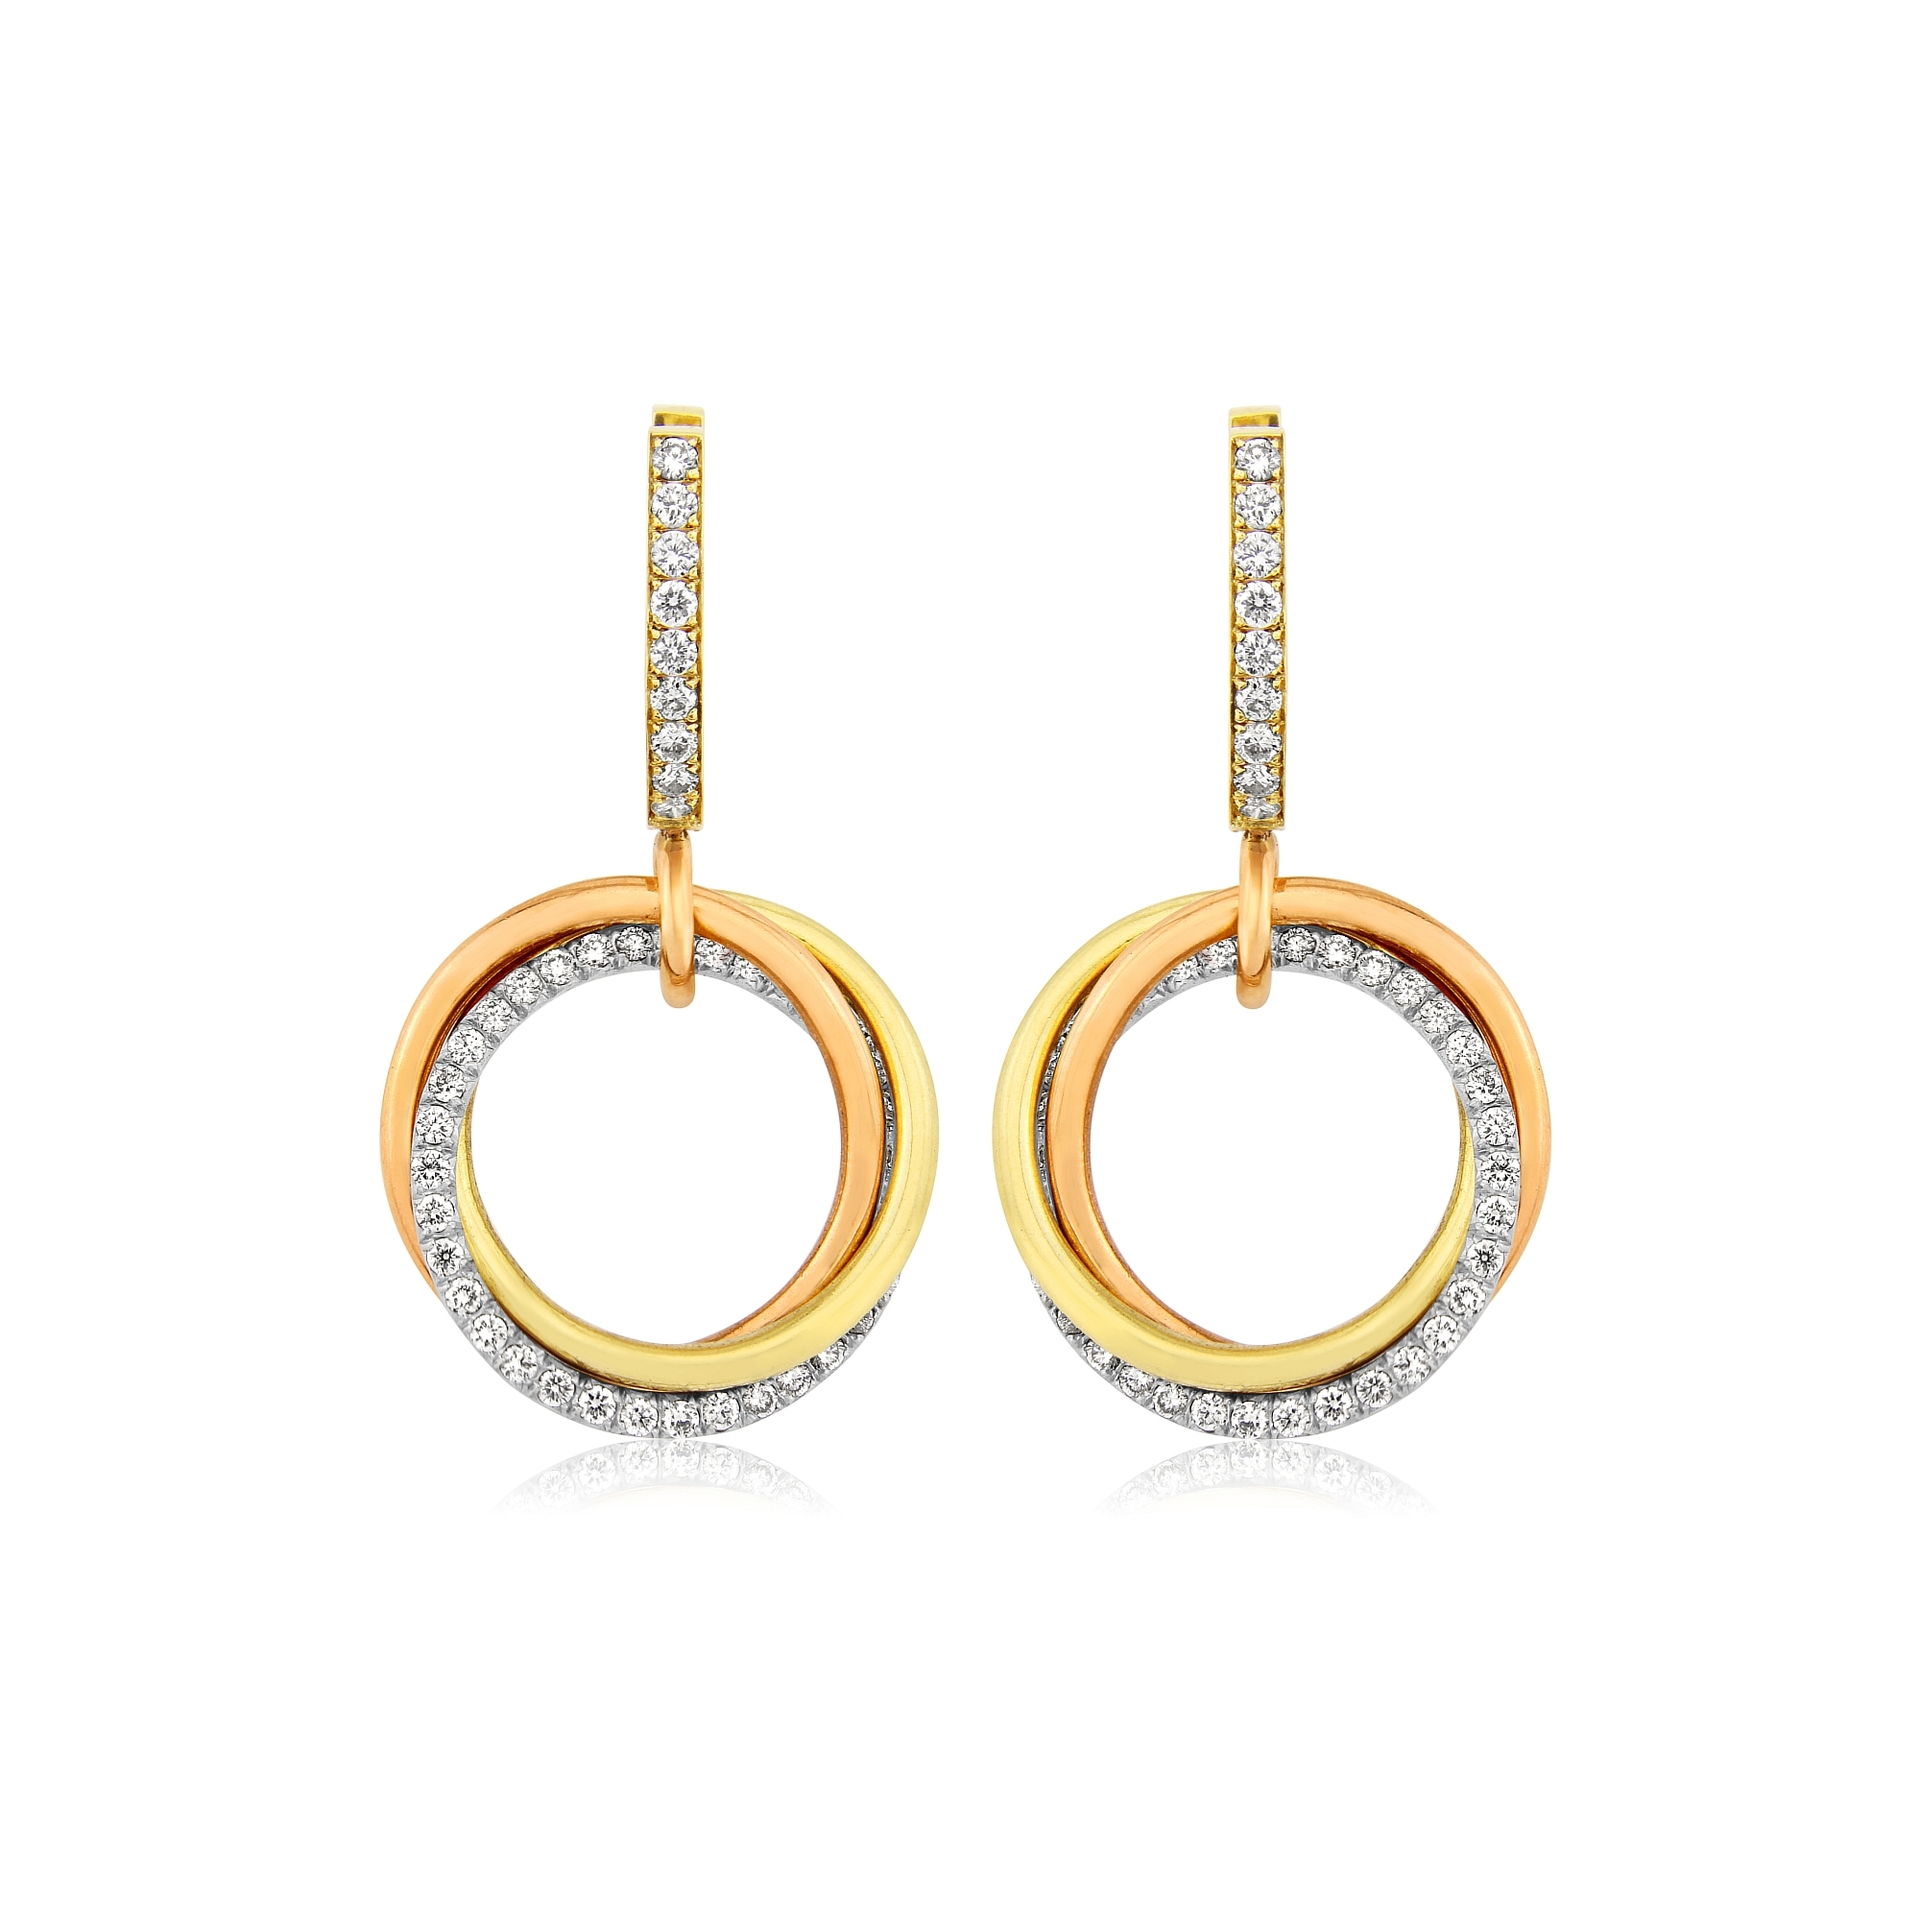 18ct Yellow Gold 3 Colour Circles, Diamond Set Earrings